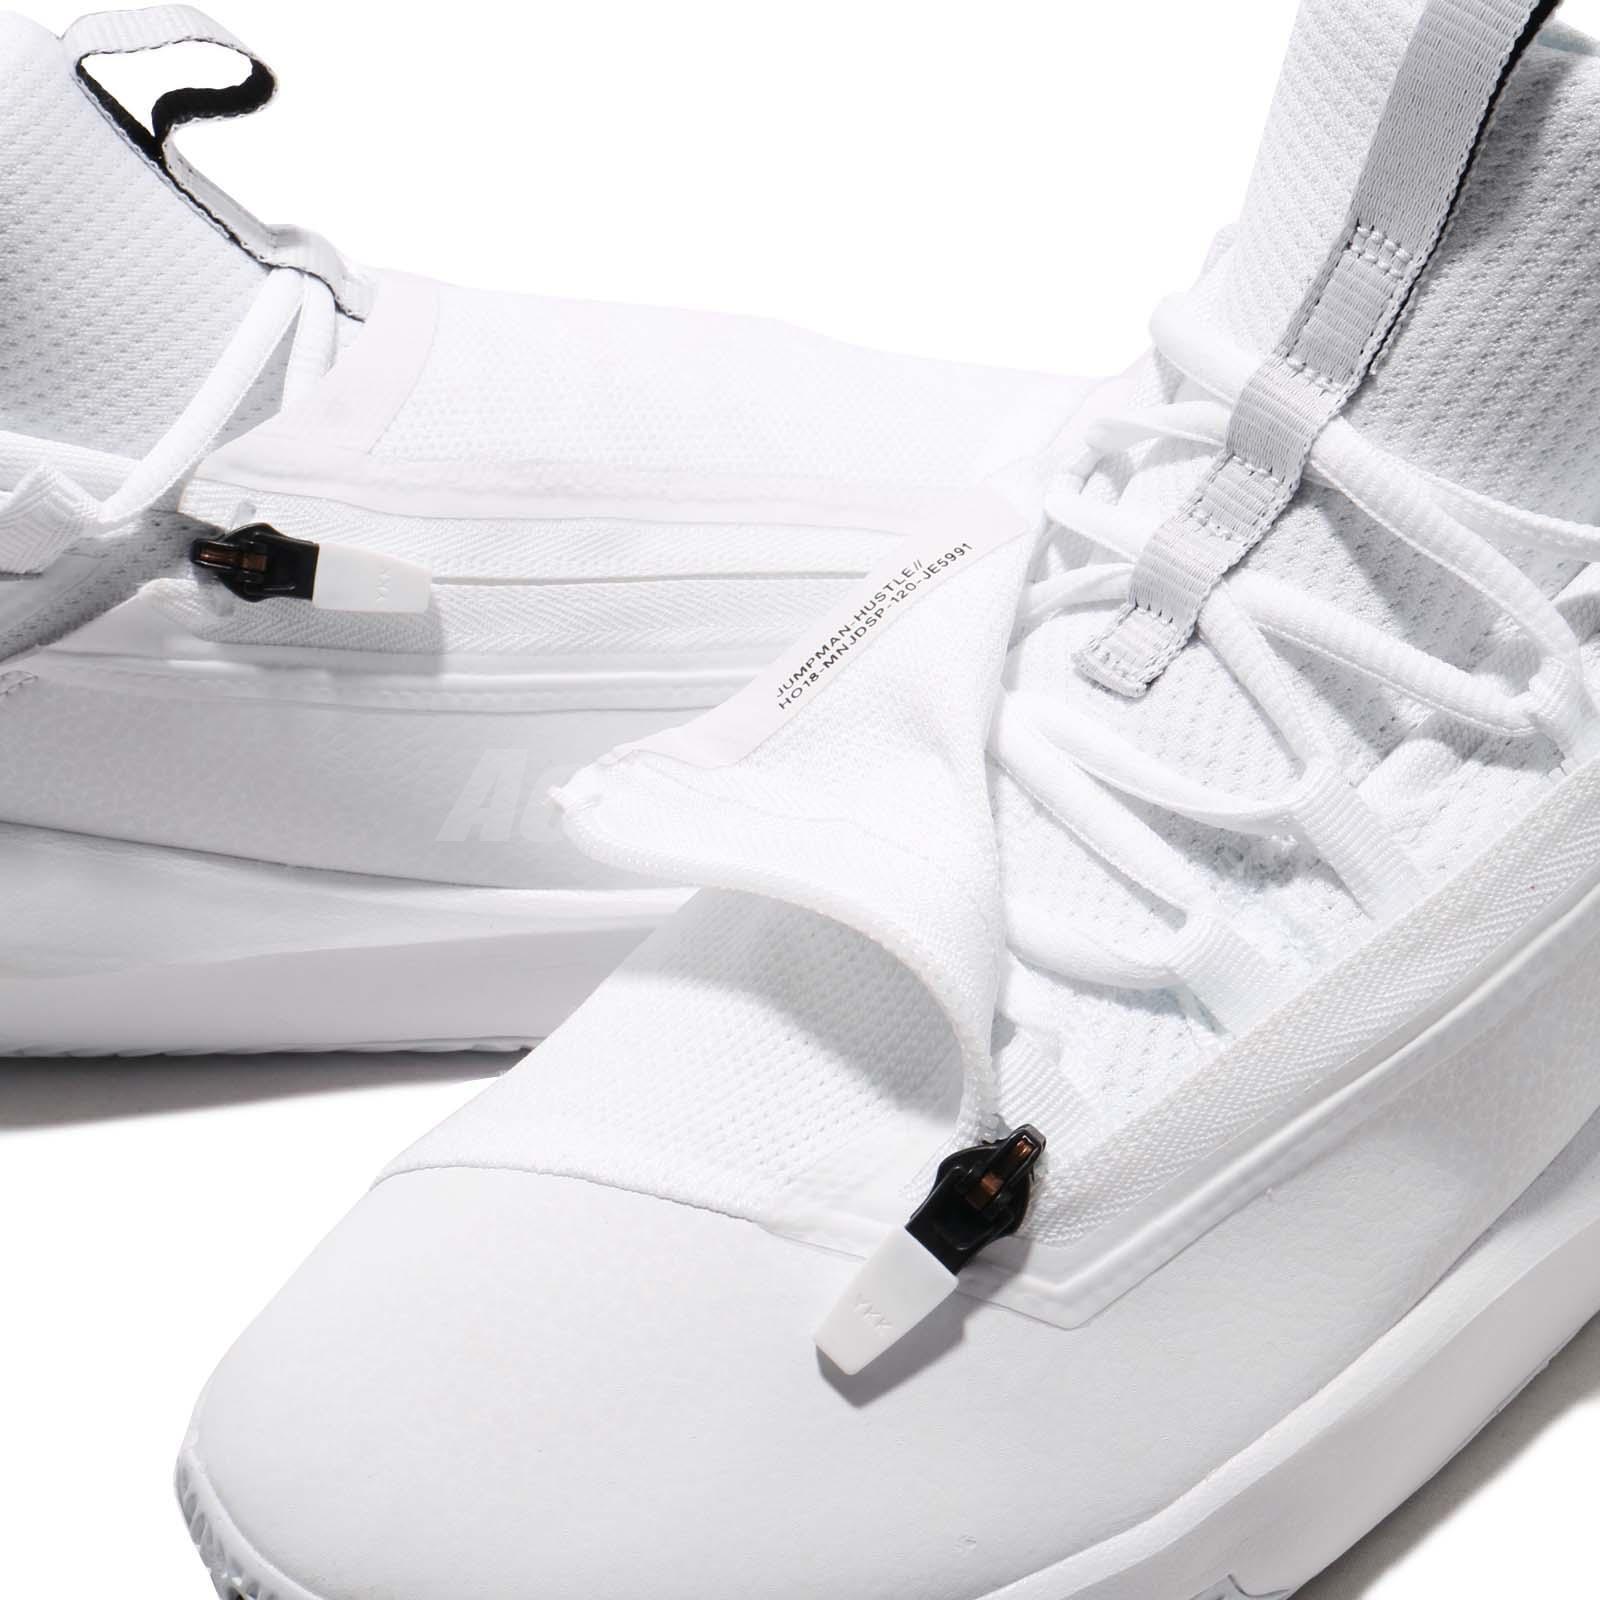 6c2f0b7b669f Nike Jordan Jumpman Hustle PF White Black Men Basketball Shoe ...